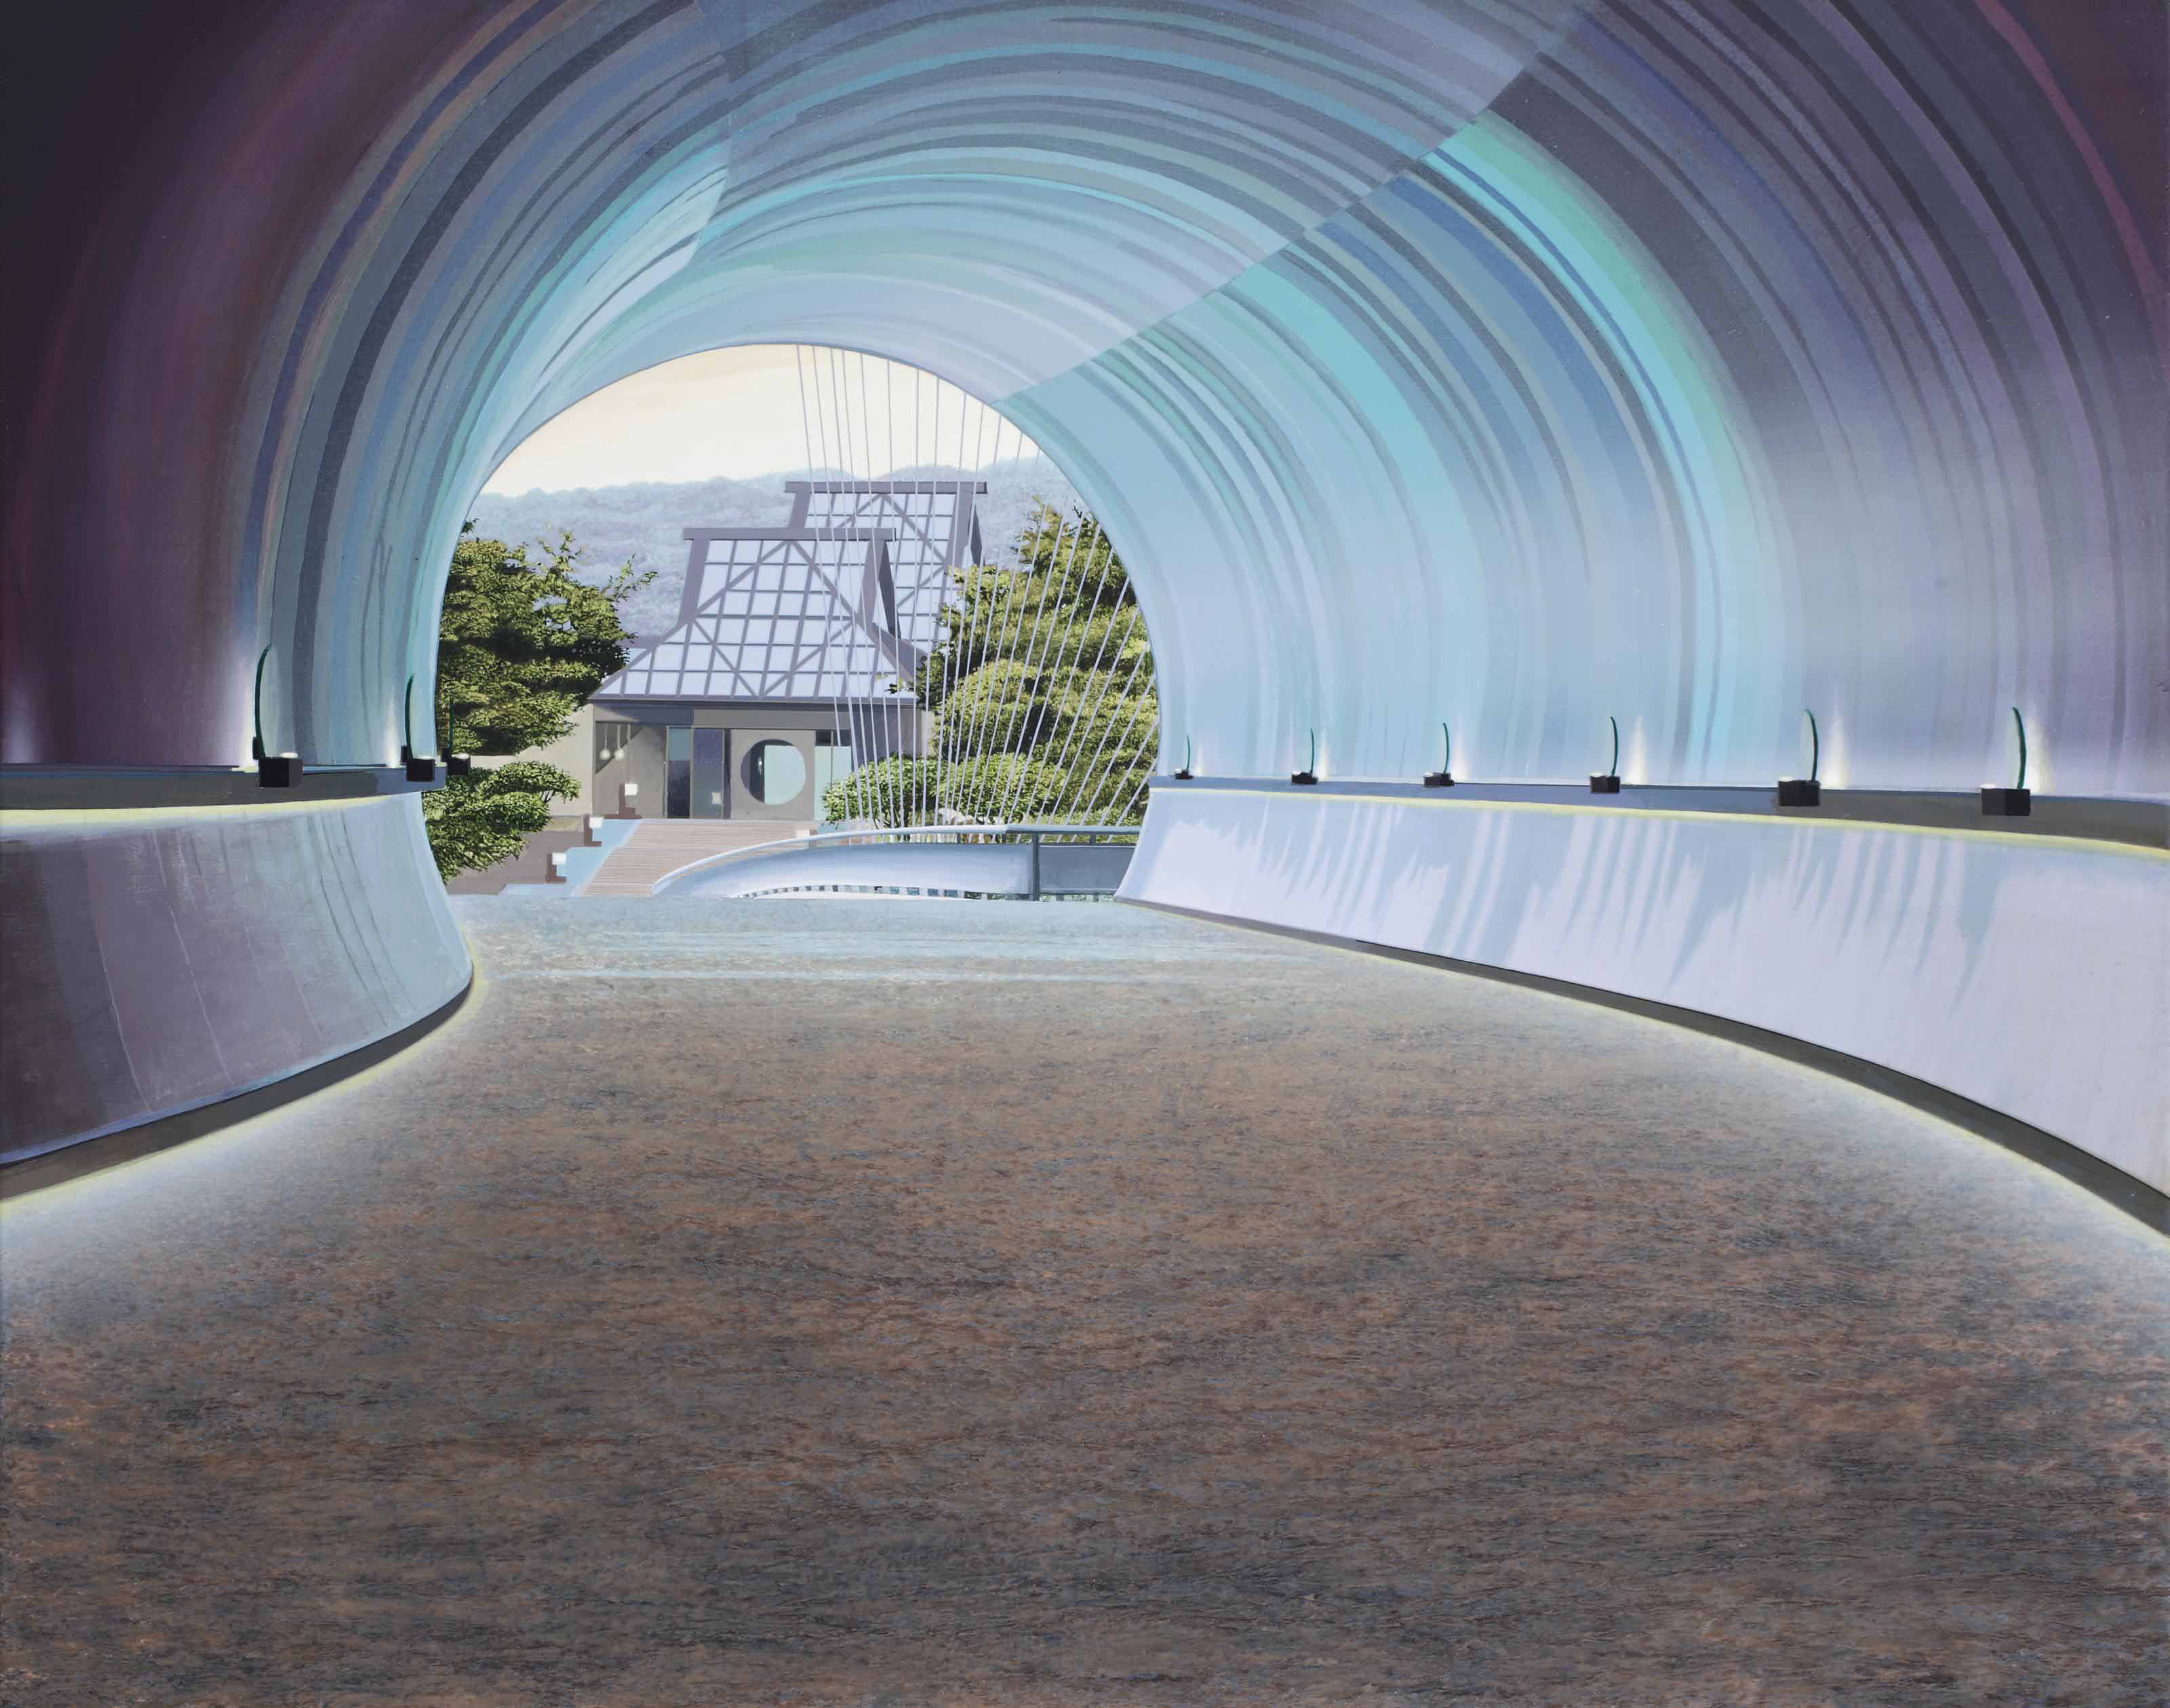 Miho tunnel, Japan